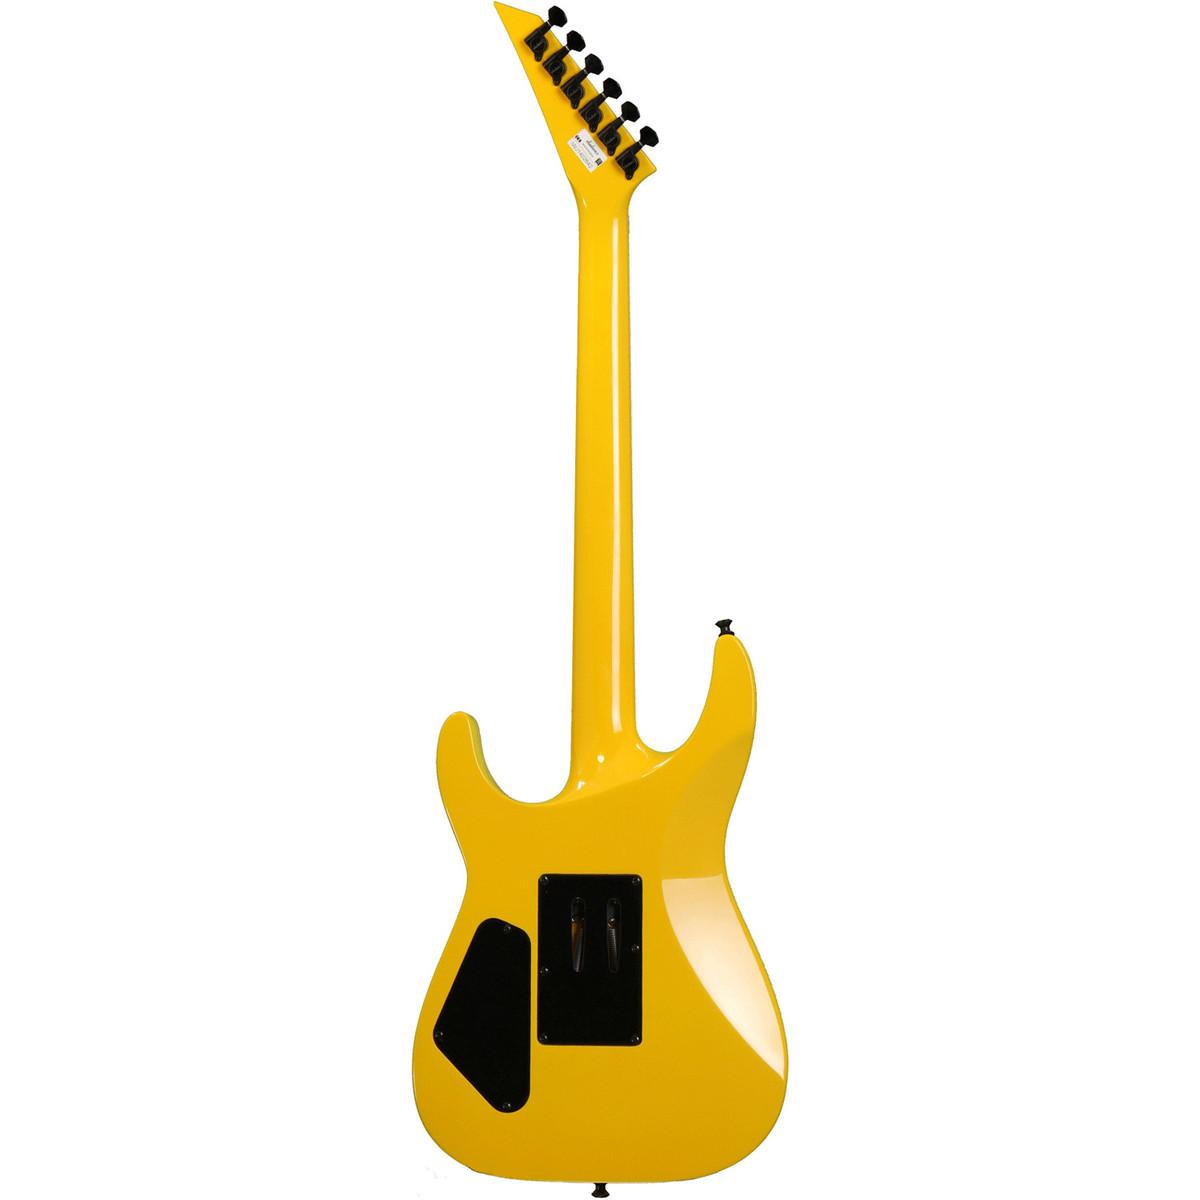 jackson x series soloist slx electric guitar taxi cab yellow at. Black Bedroom Furniture Sets. Home Design Ideas